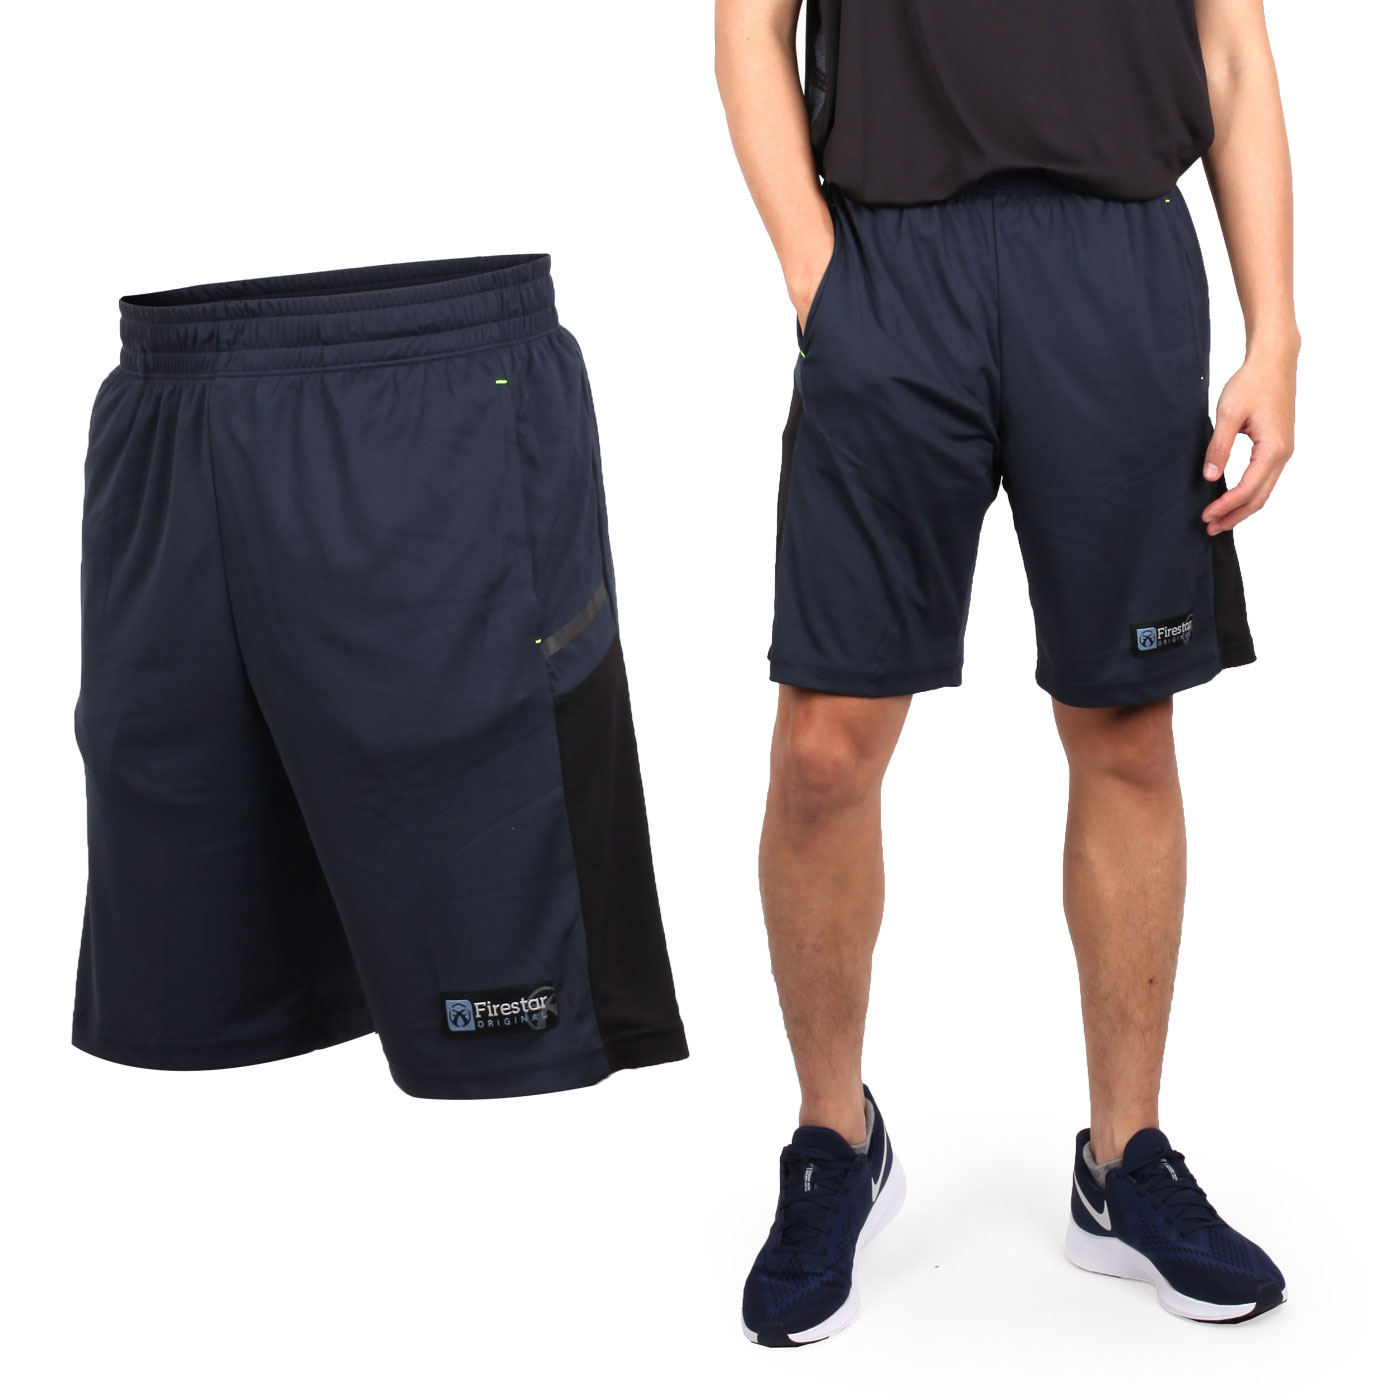 FIRESTAR 男吸濕排汗籃球短褲 B9203-10 - 丈青黑